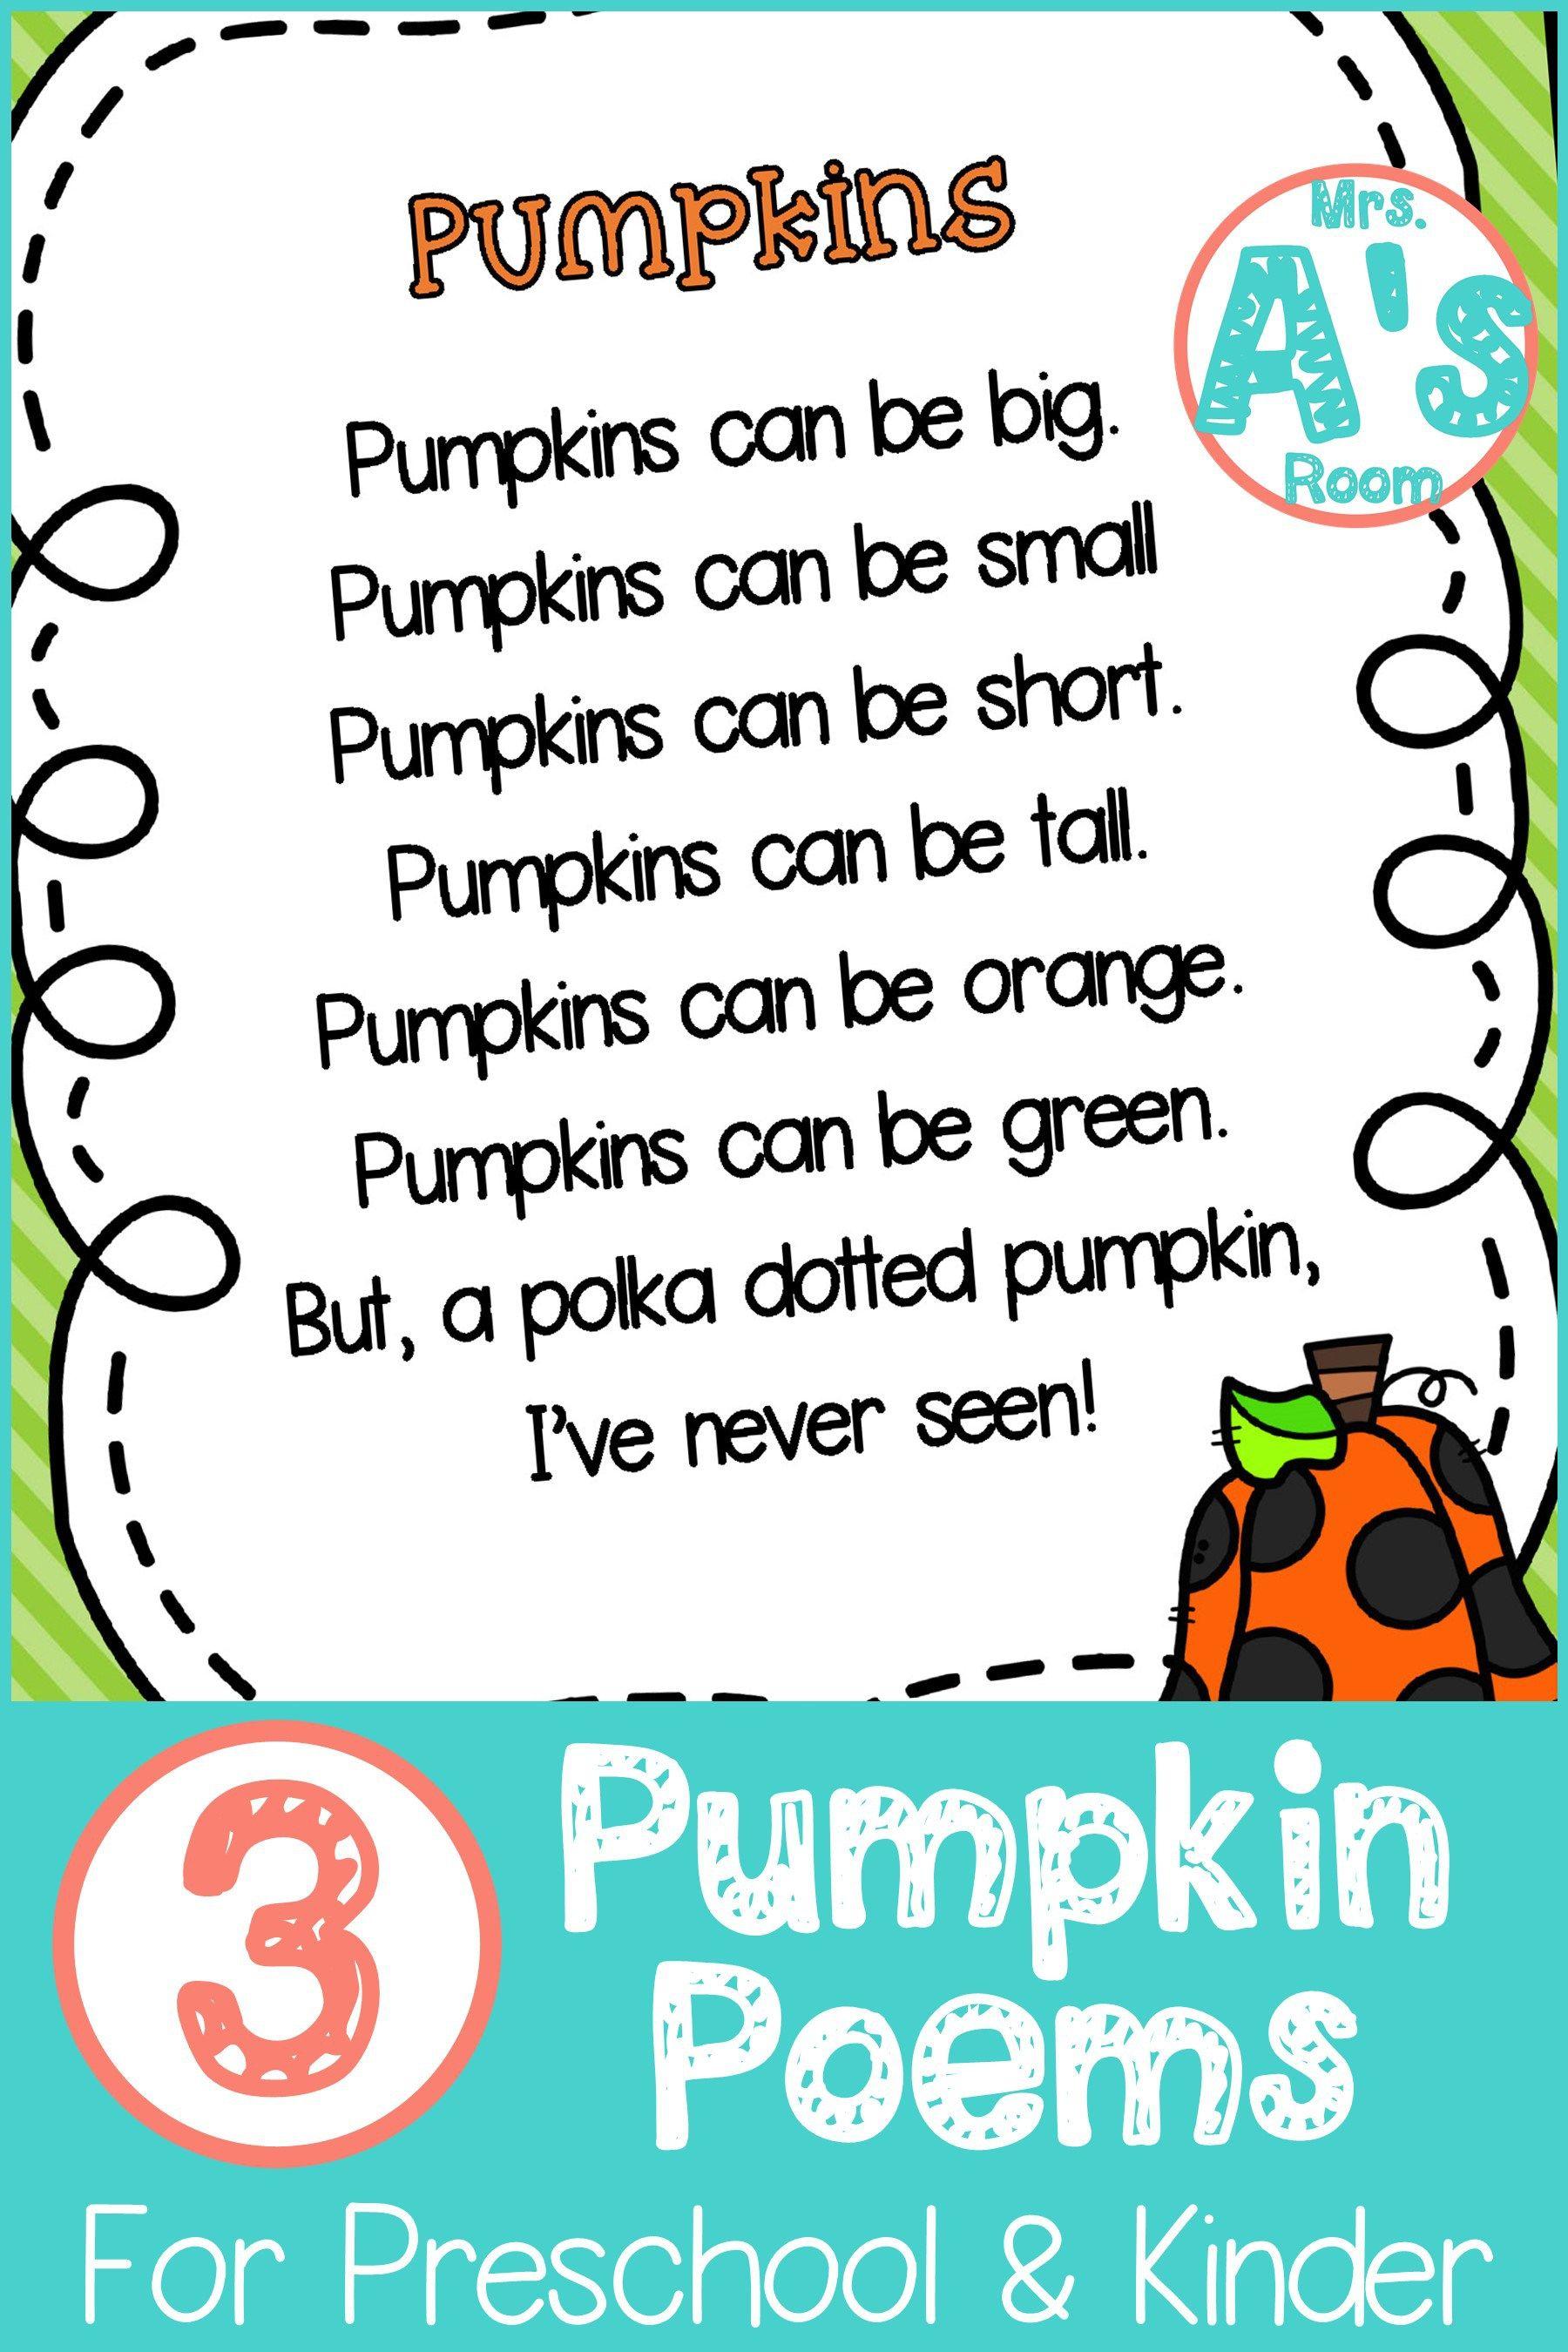 Three Pumpkins Poems For Preschool